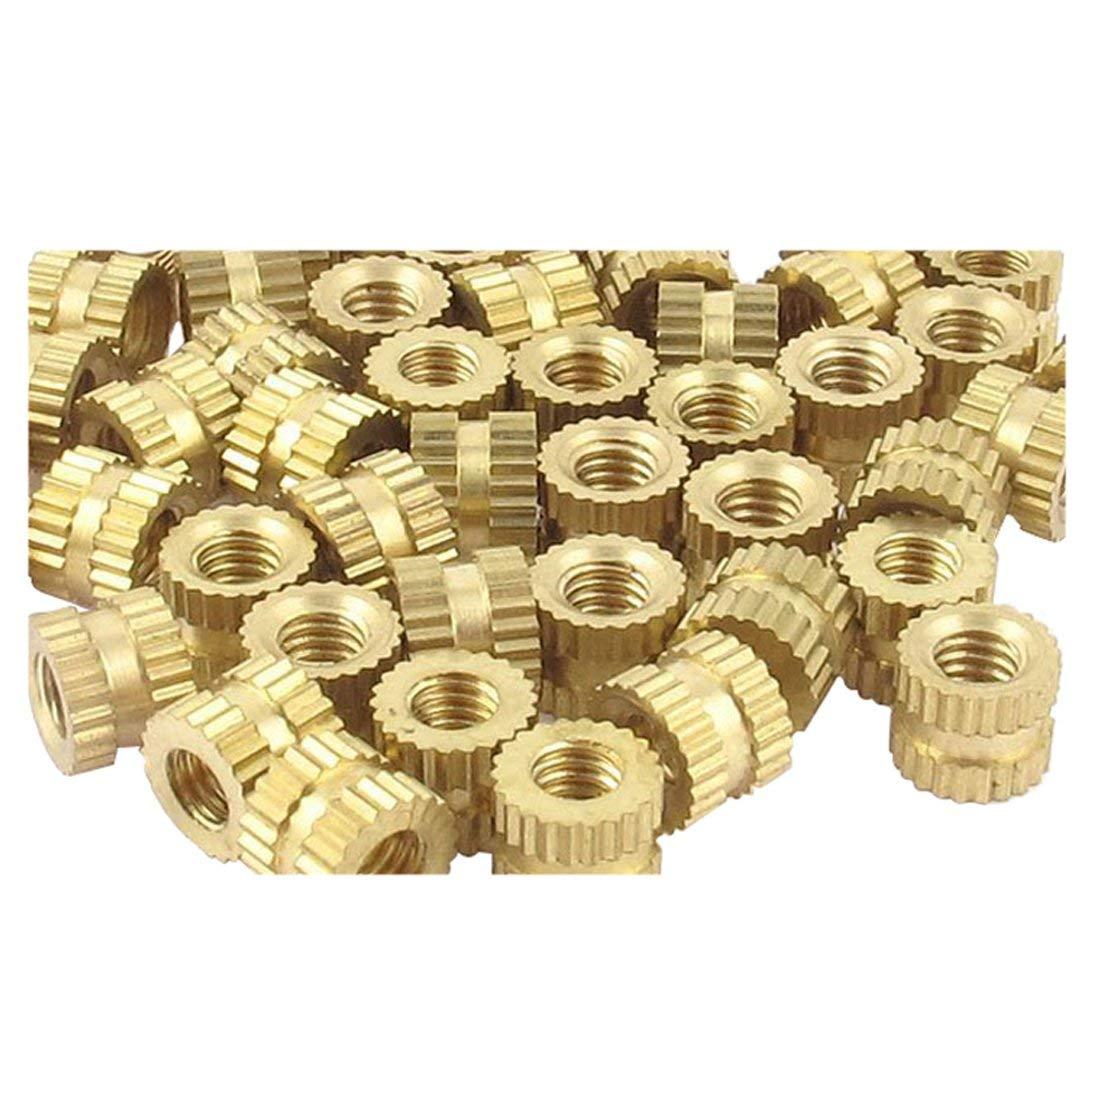 Axiwen 10Pcs Injection Molding Brass Thread Knurled Inserts Nuts 3mm x 5mm x 4mm